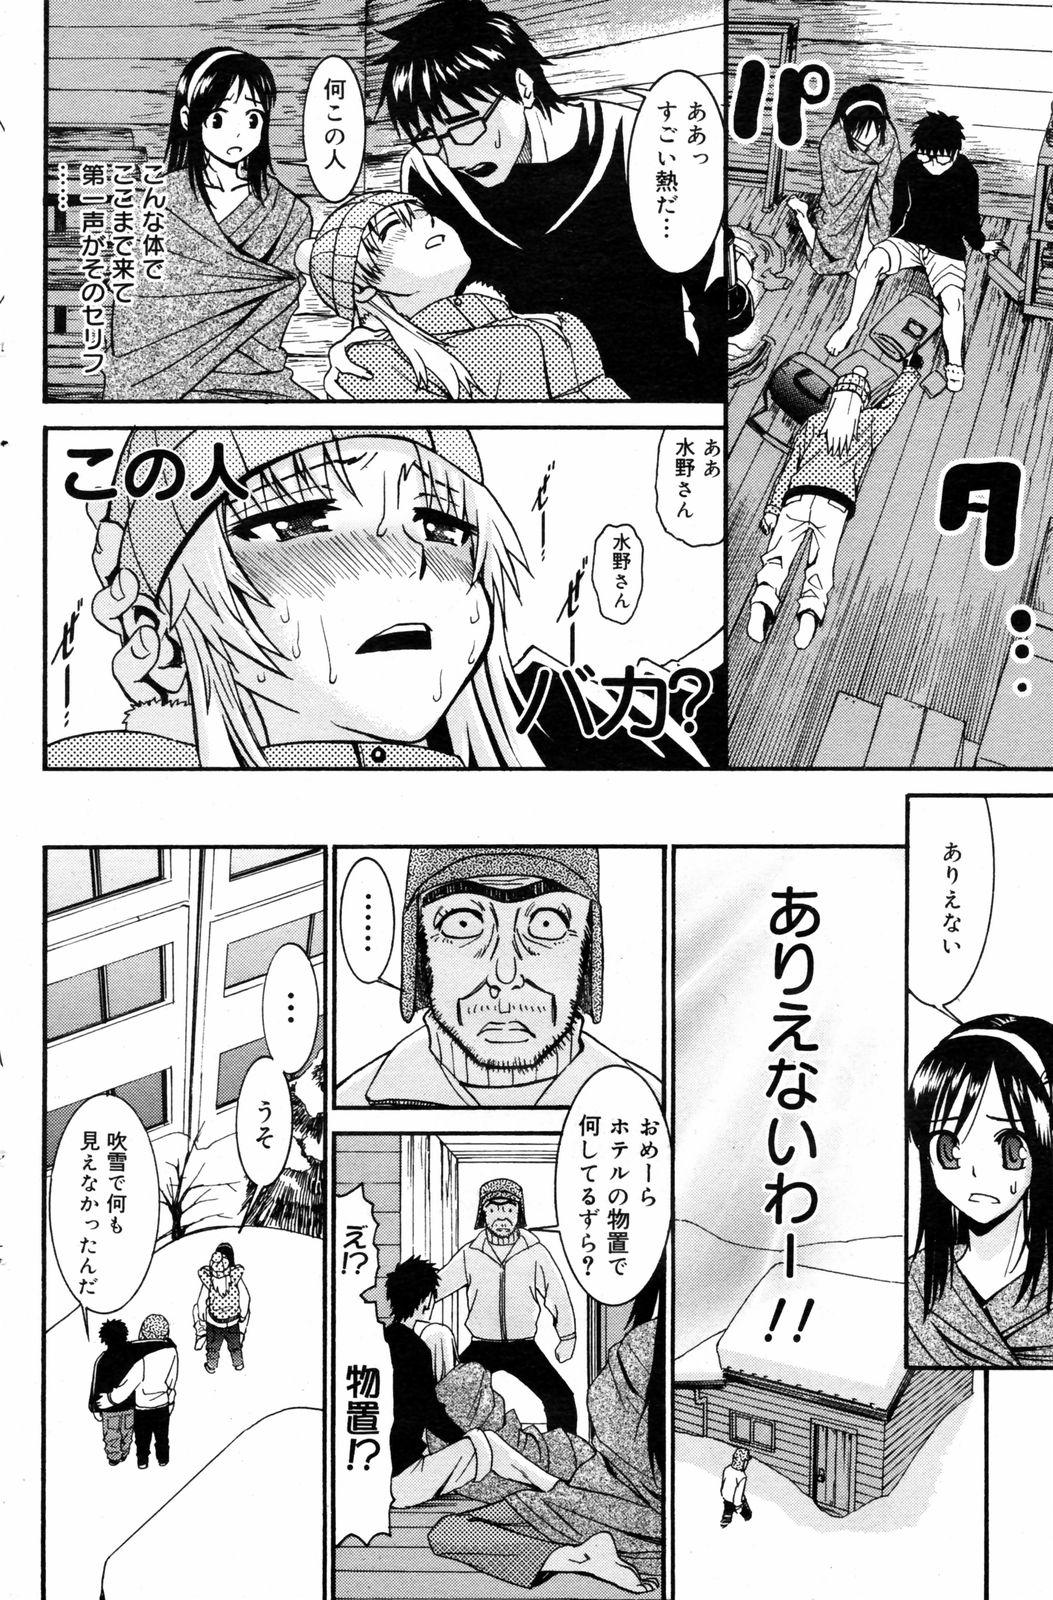 Manga Bangaichi 2008-03 145